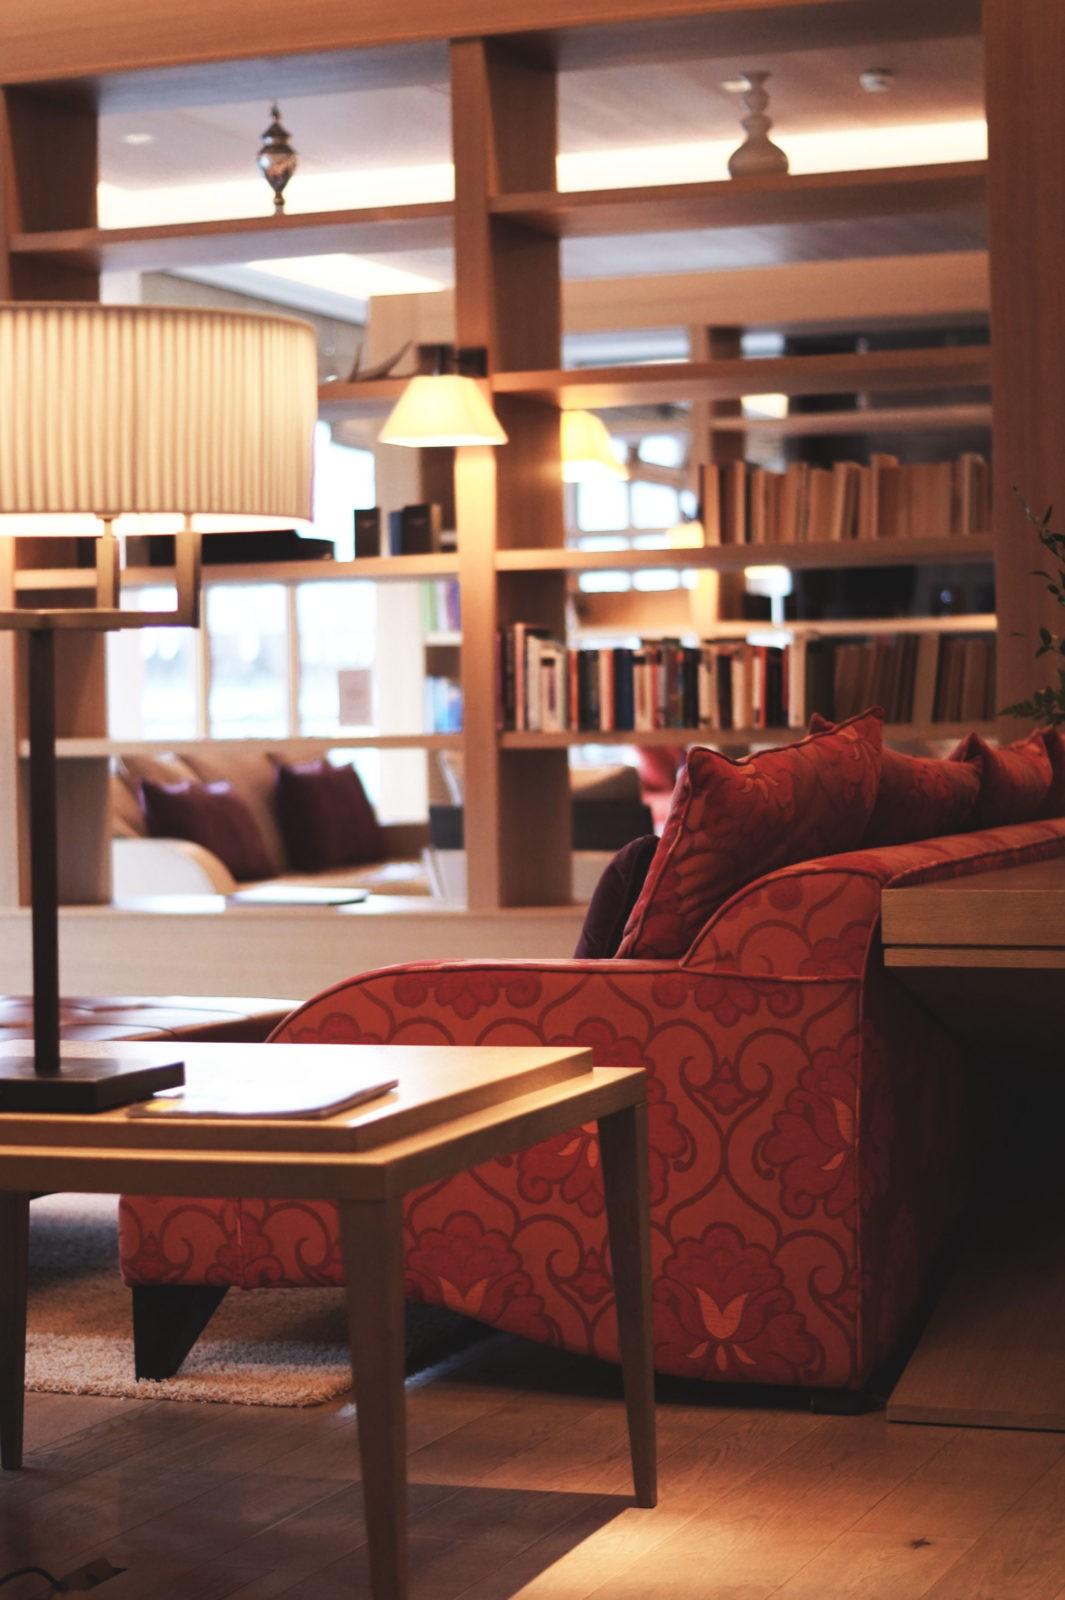 hotel review travel charme ifen hotel kleinwalsertal austria sterreich hotelbewertung lobby. Black Bedroom Furniture Sets. Home Design Ideas